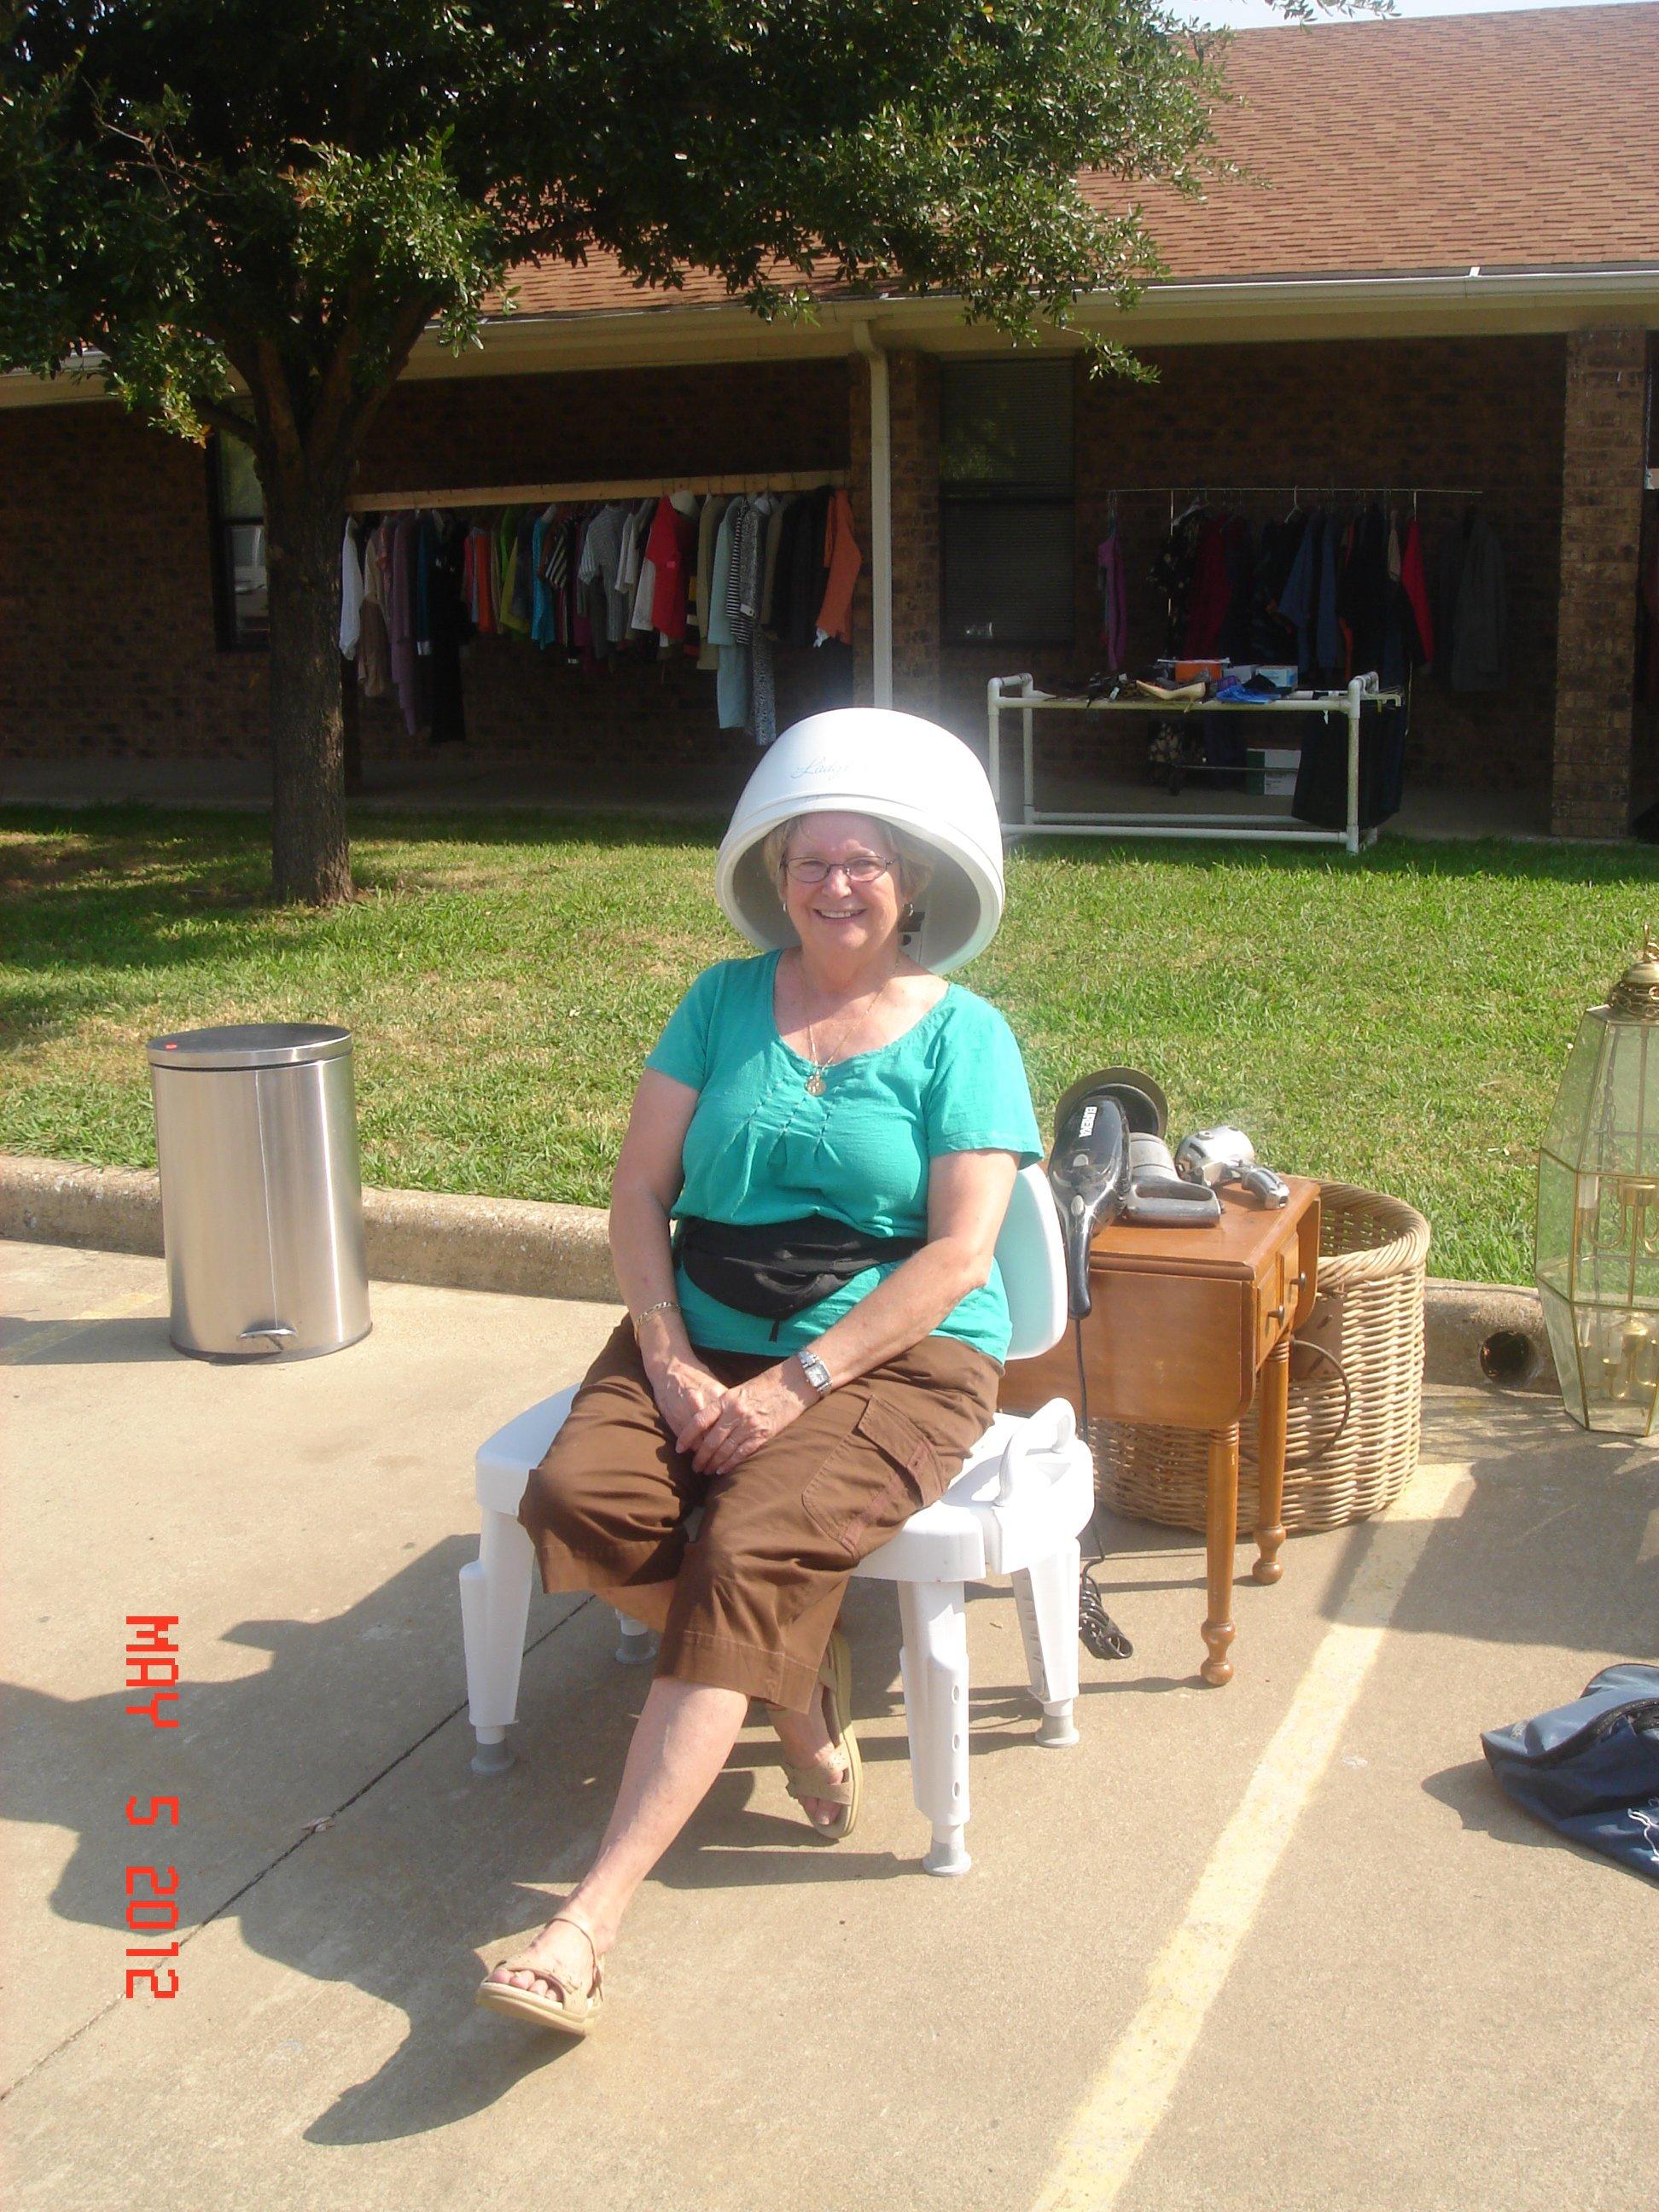 Rummage Sale lady sitting in hair dryer